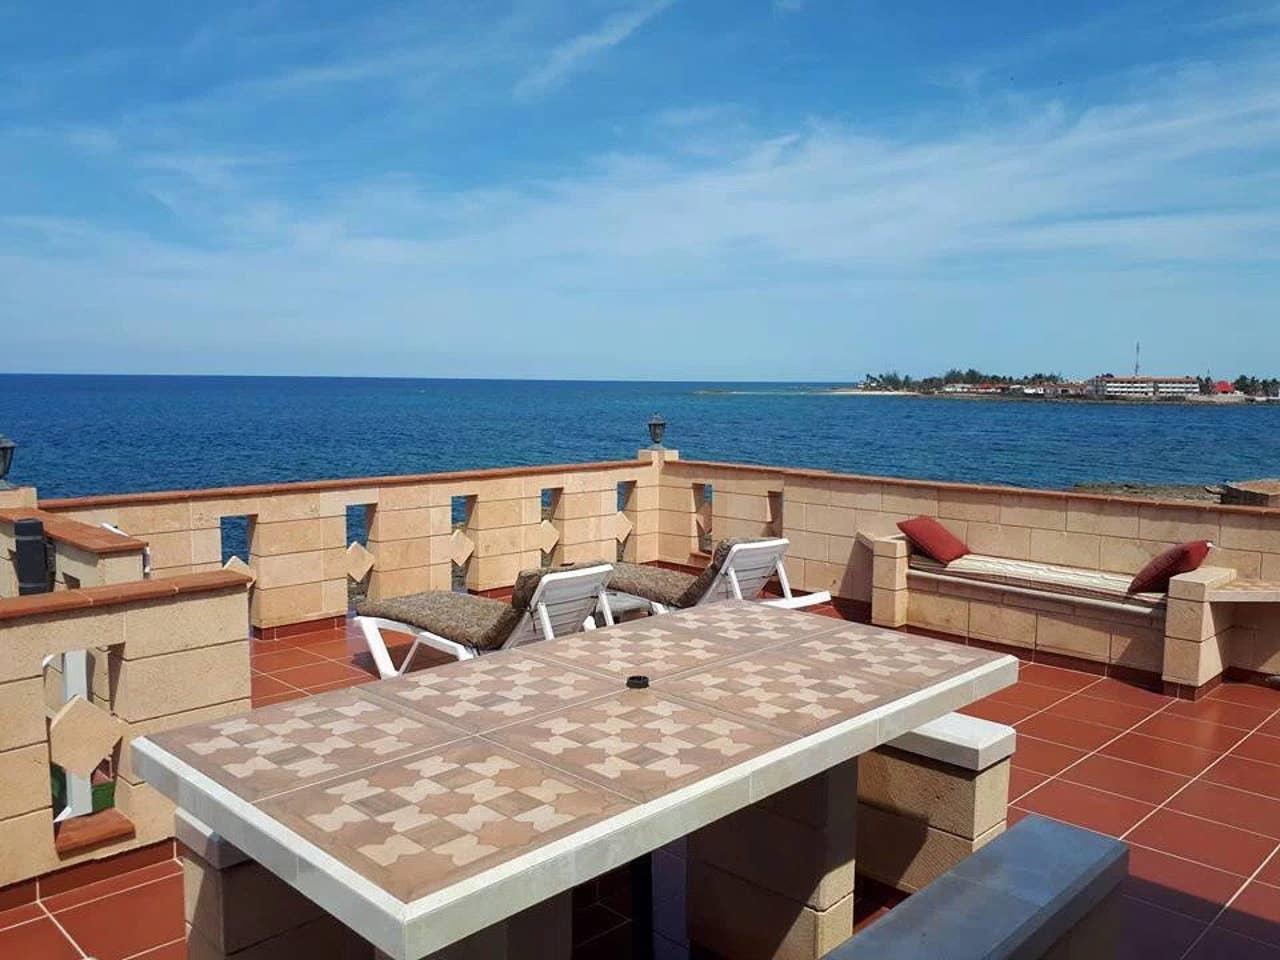 Apartment Casa Oceanview 3 - Luxury   Amazing View photo 23408869